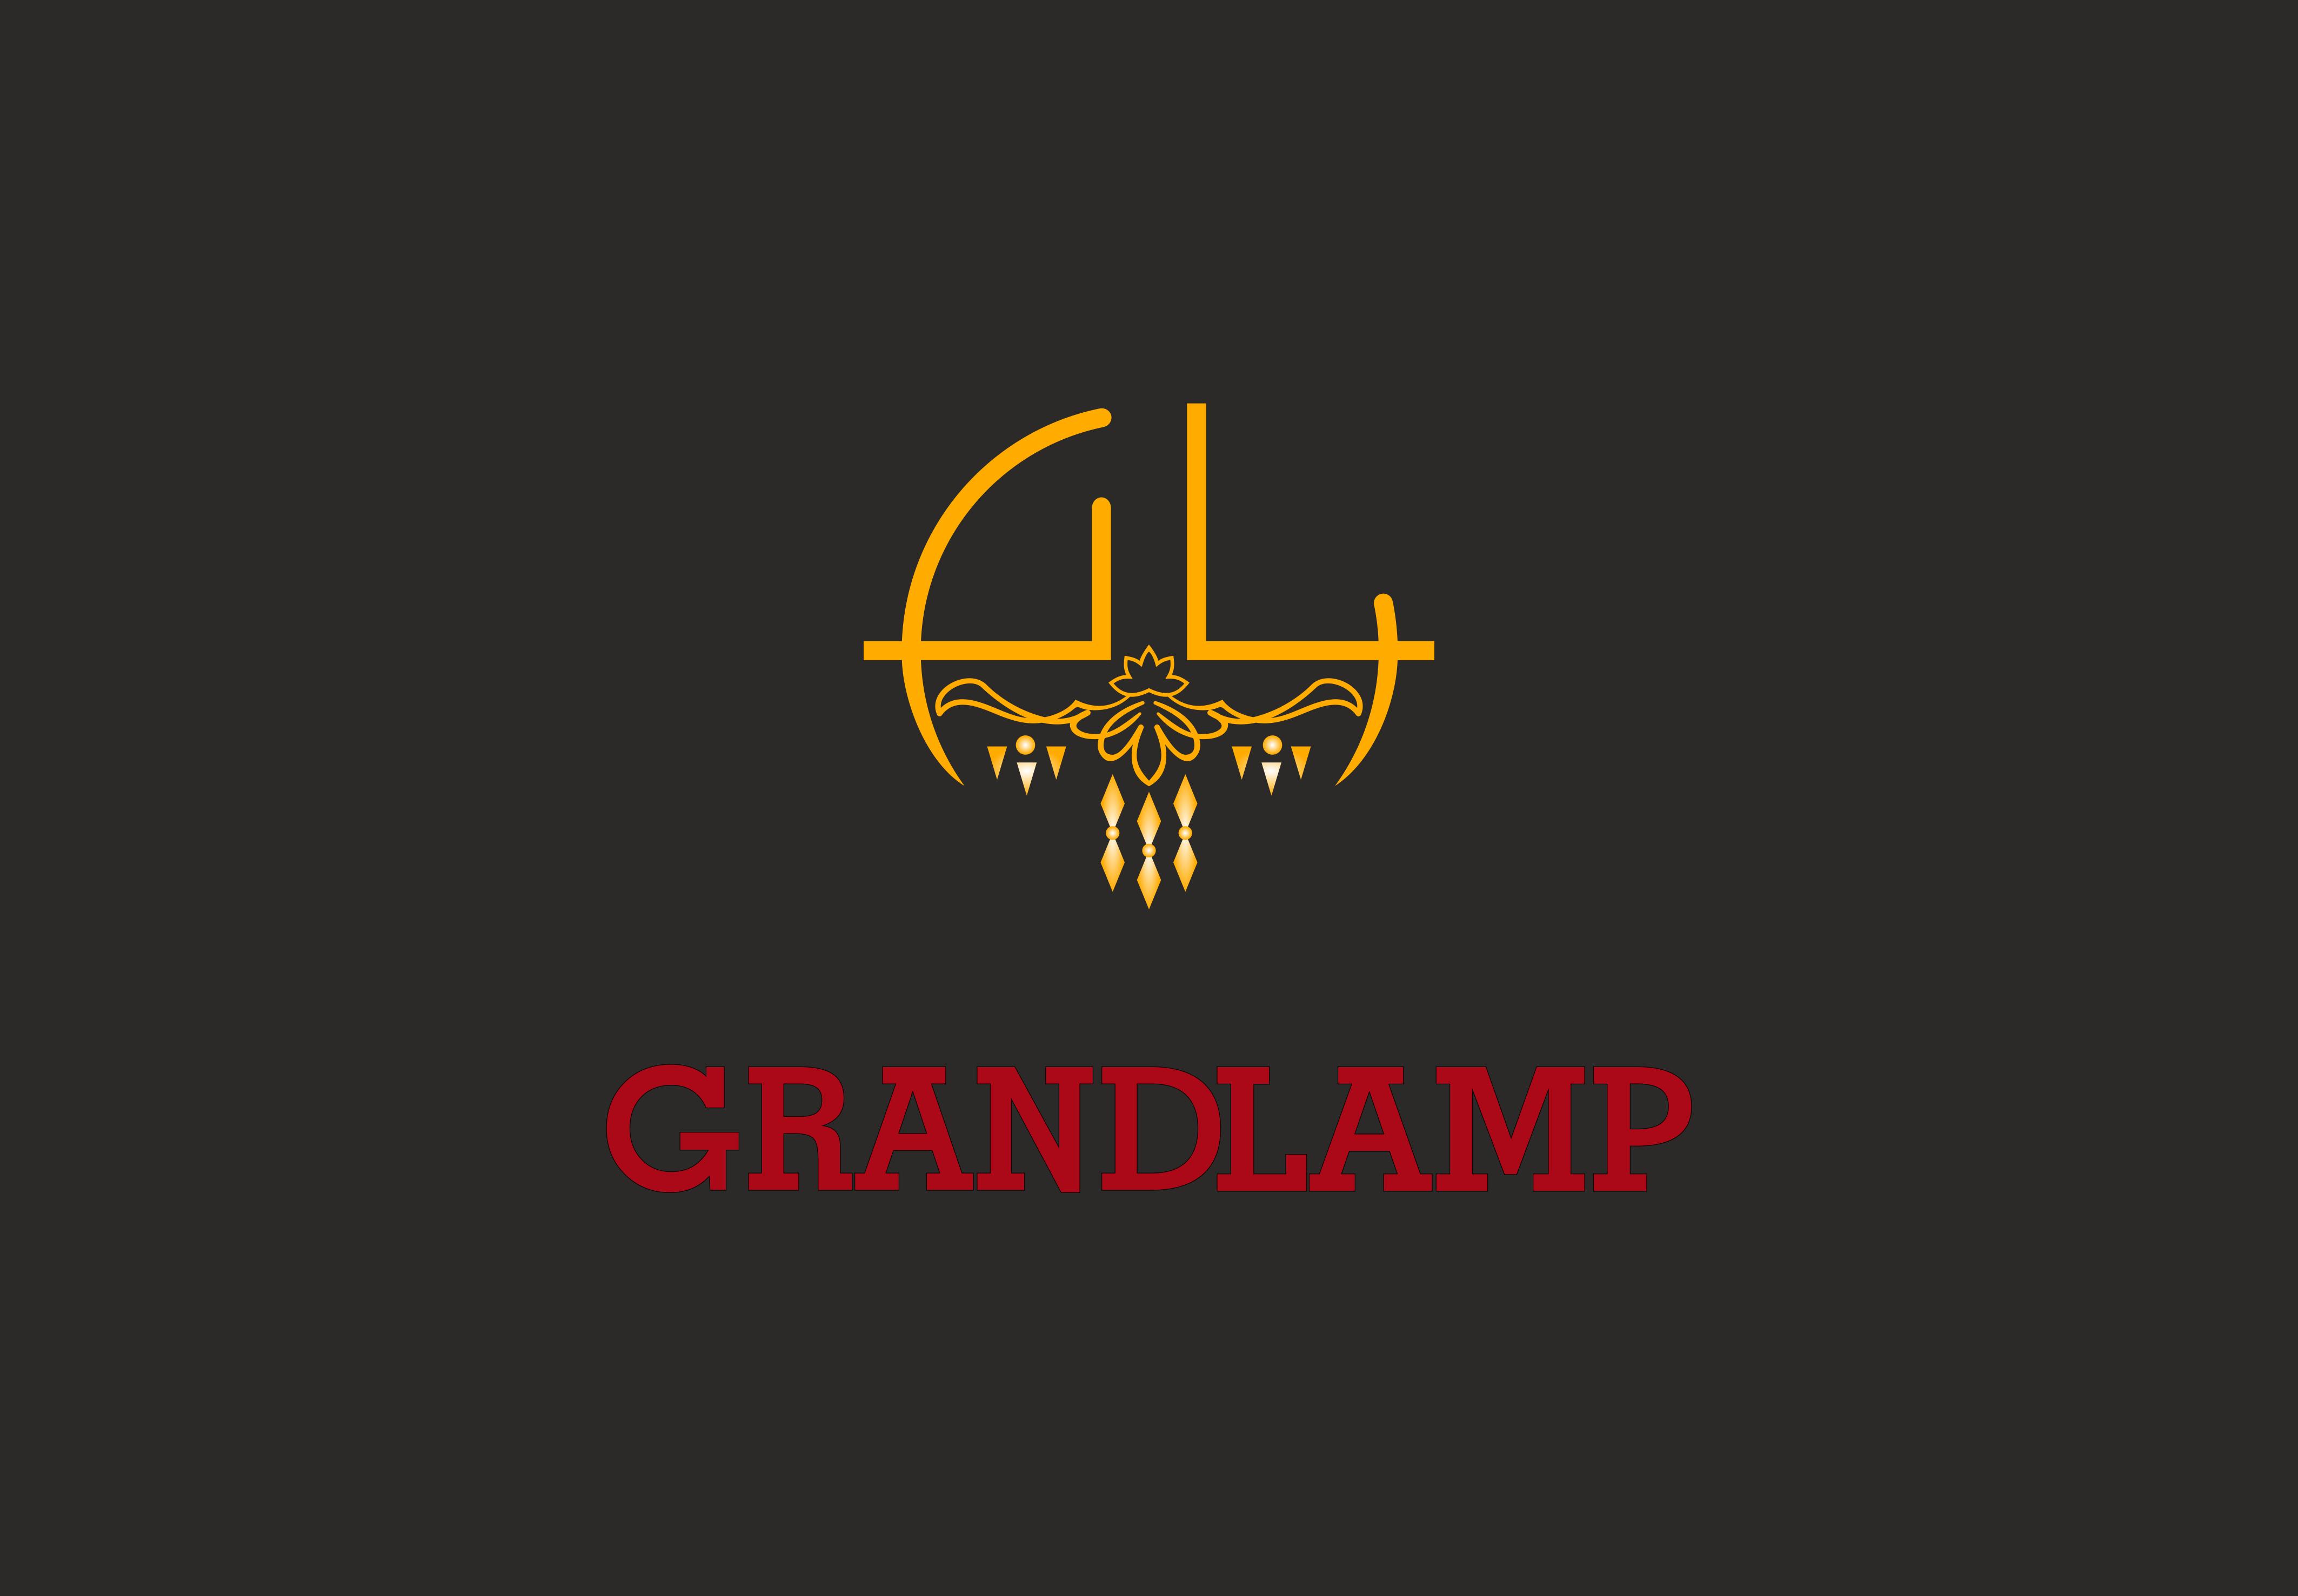 Разработка логотипа и элементов фирменного стиля фото f_87357fb16442c806.png